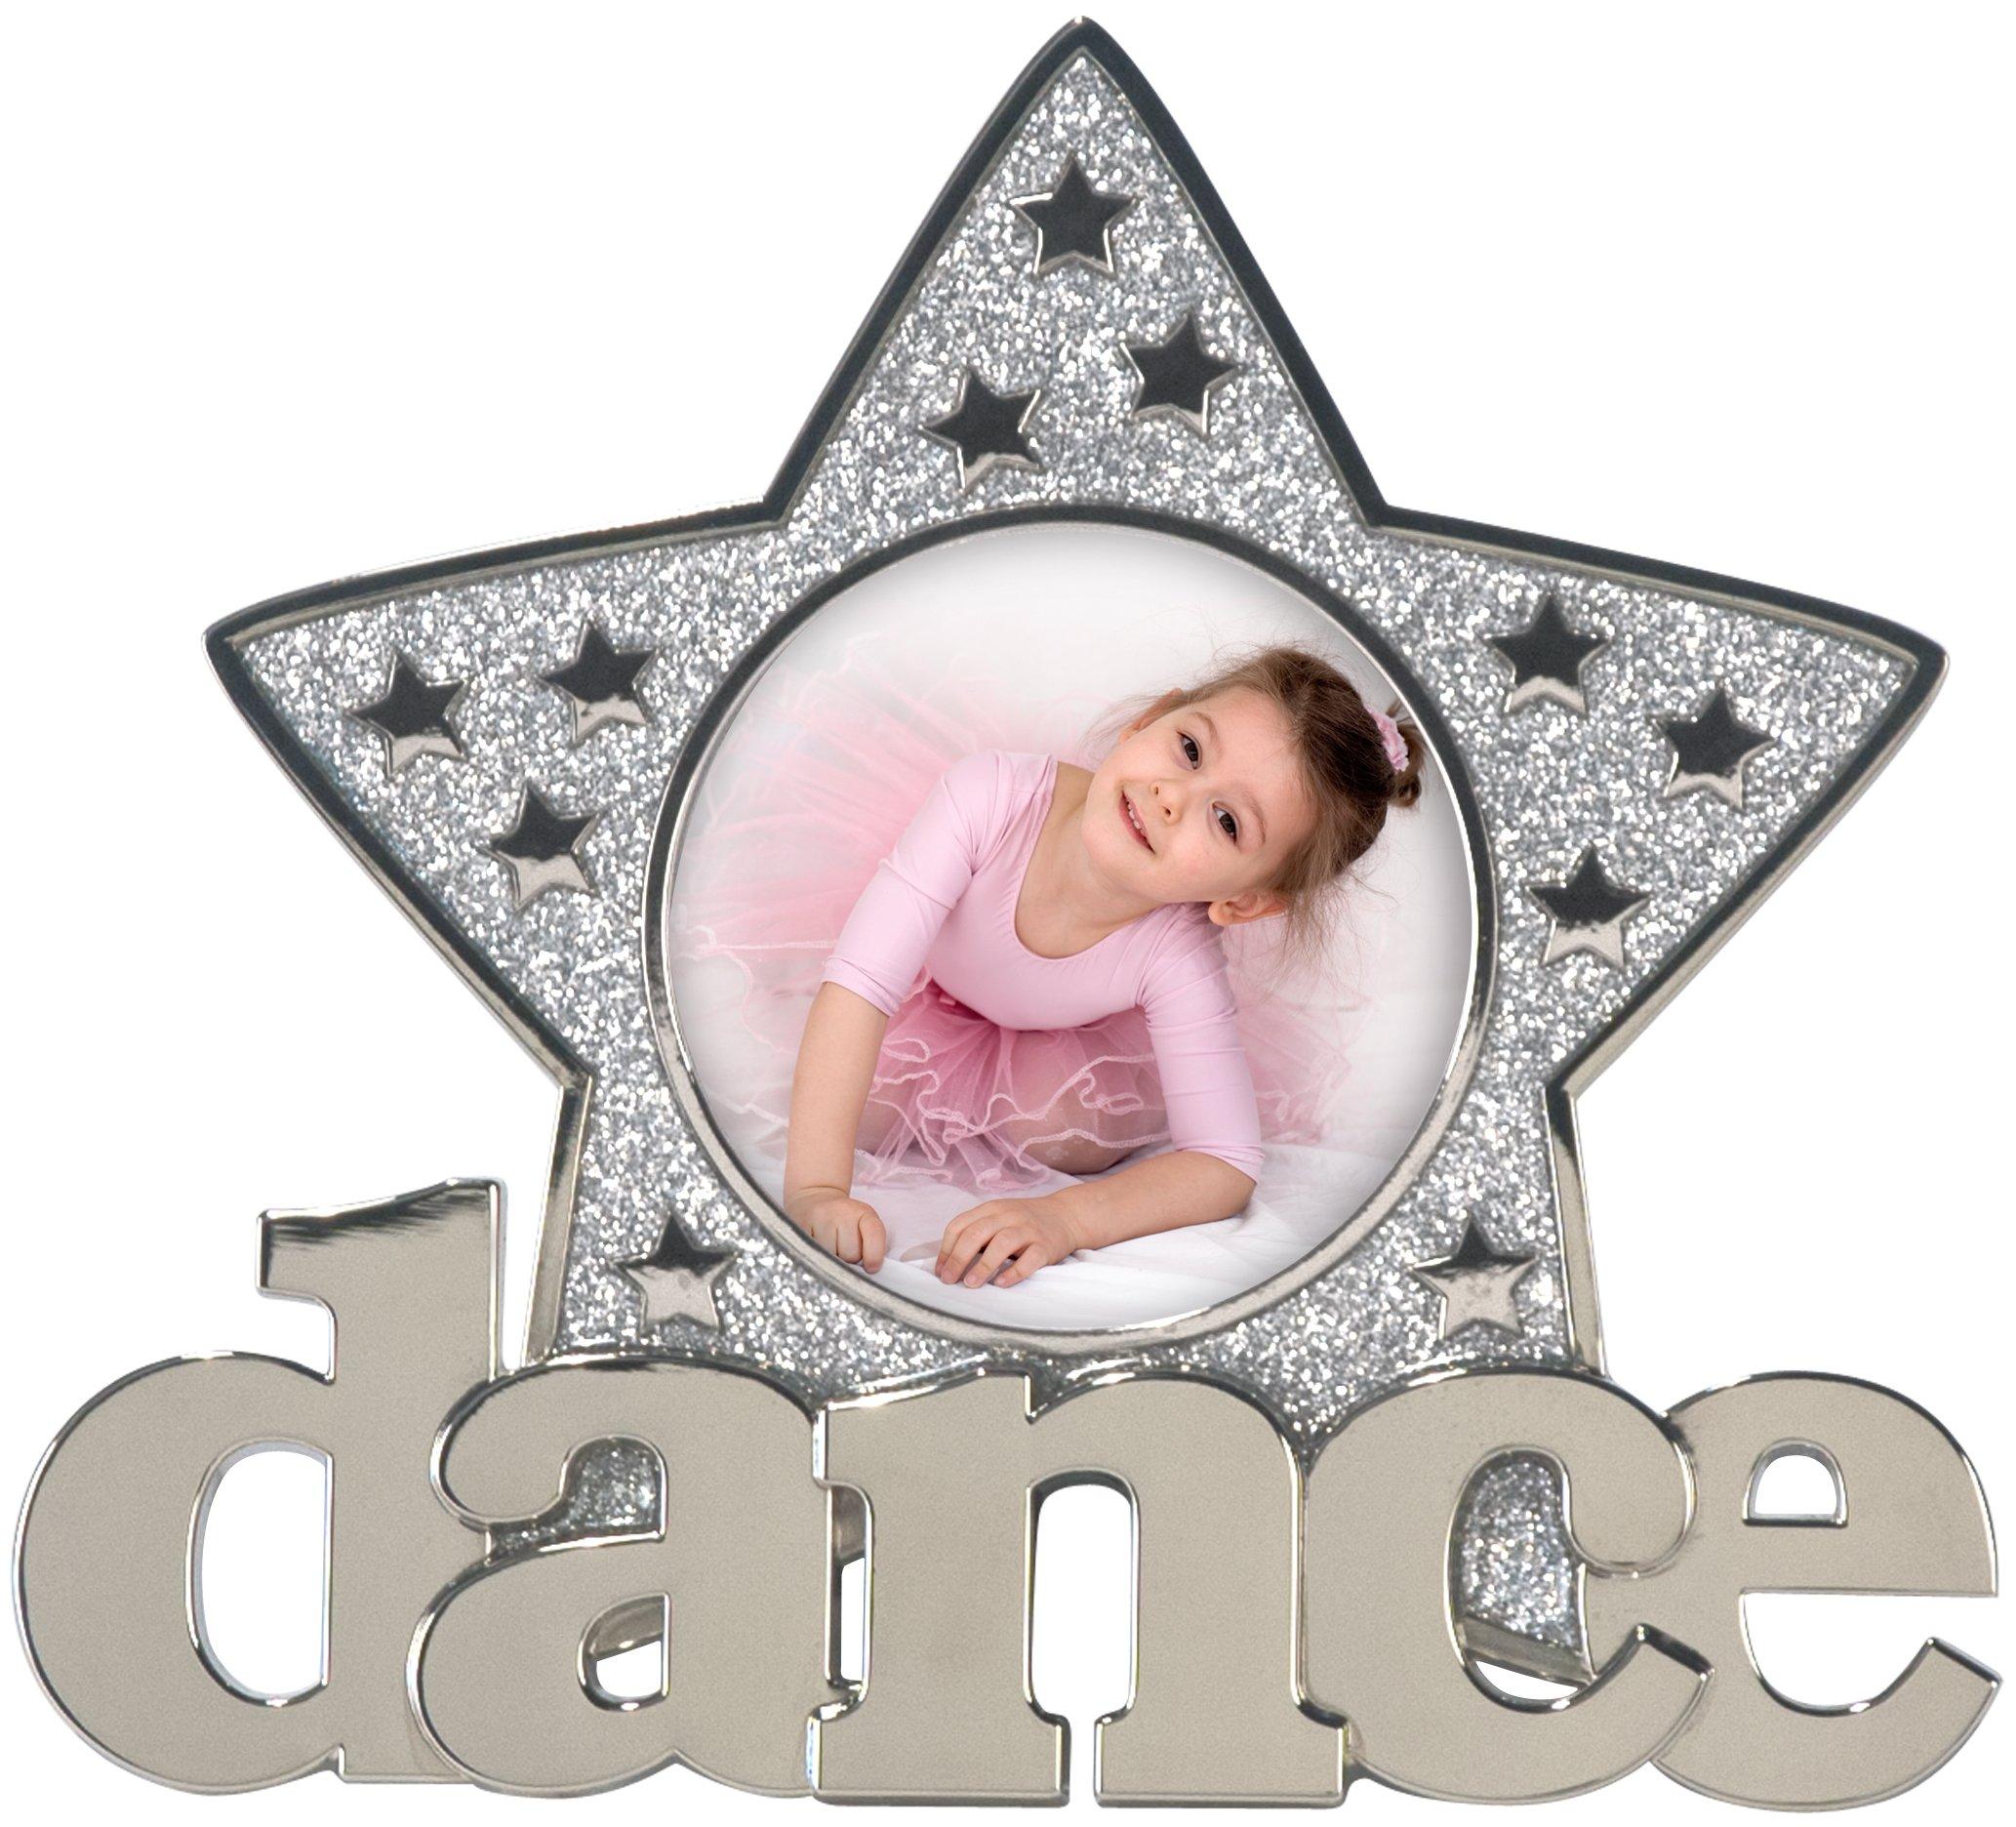 Malden International Designs Dance Glitter Star Metal Picture Frame, 3x3, Silver by Malden International Designs (Image #1)